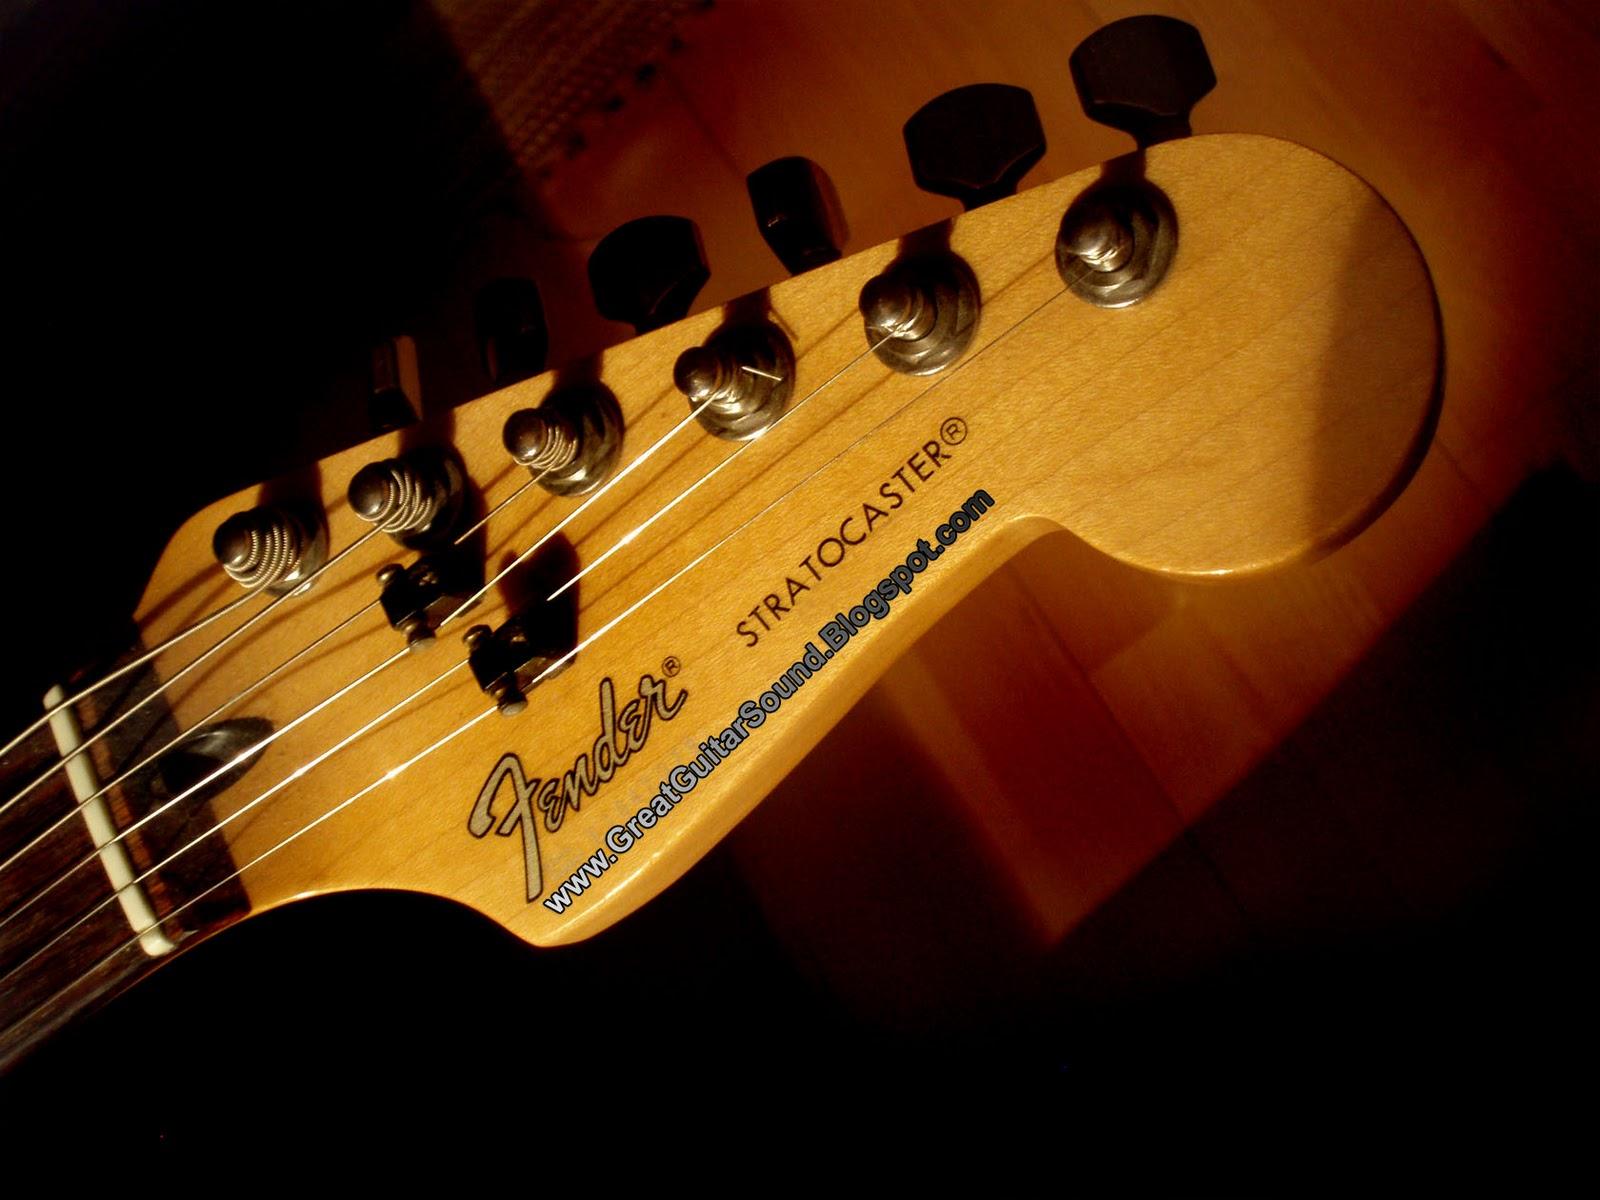 Gallery For gt Fender Guitar Wallpaper 1600x1200